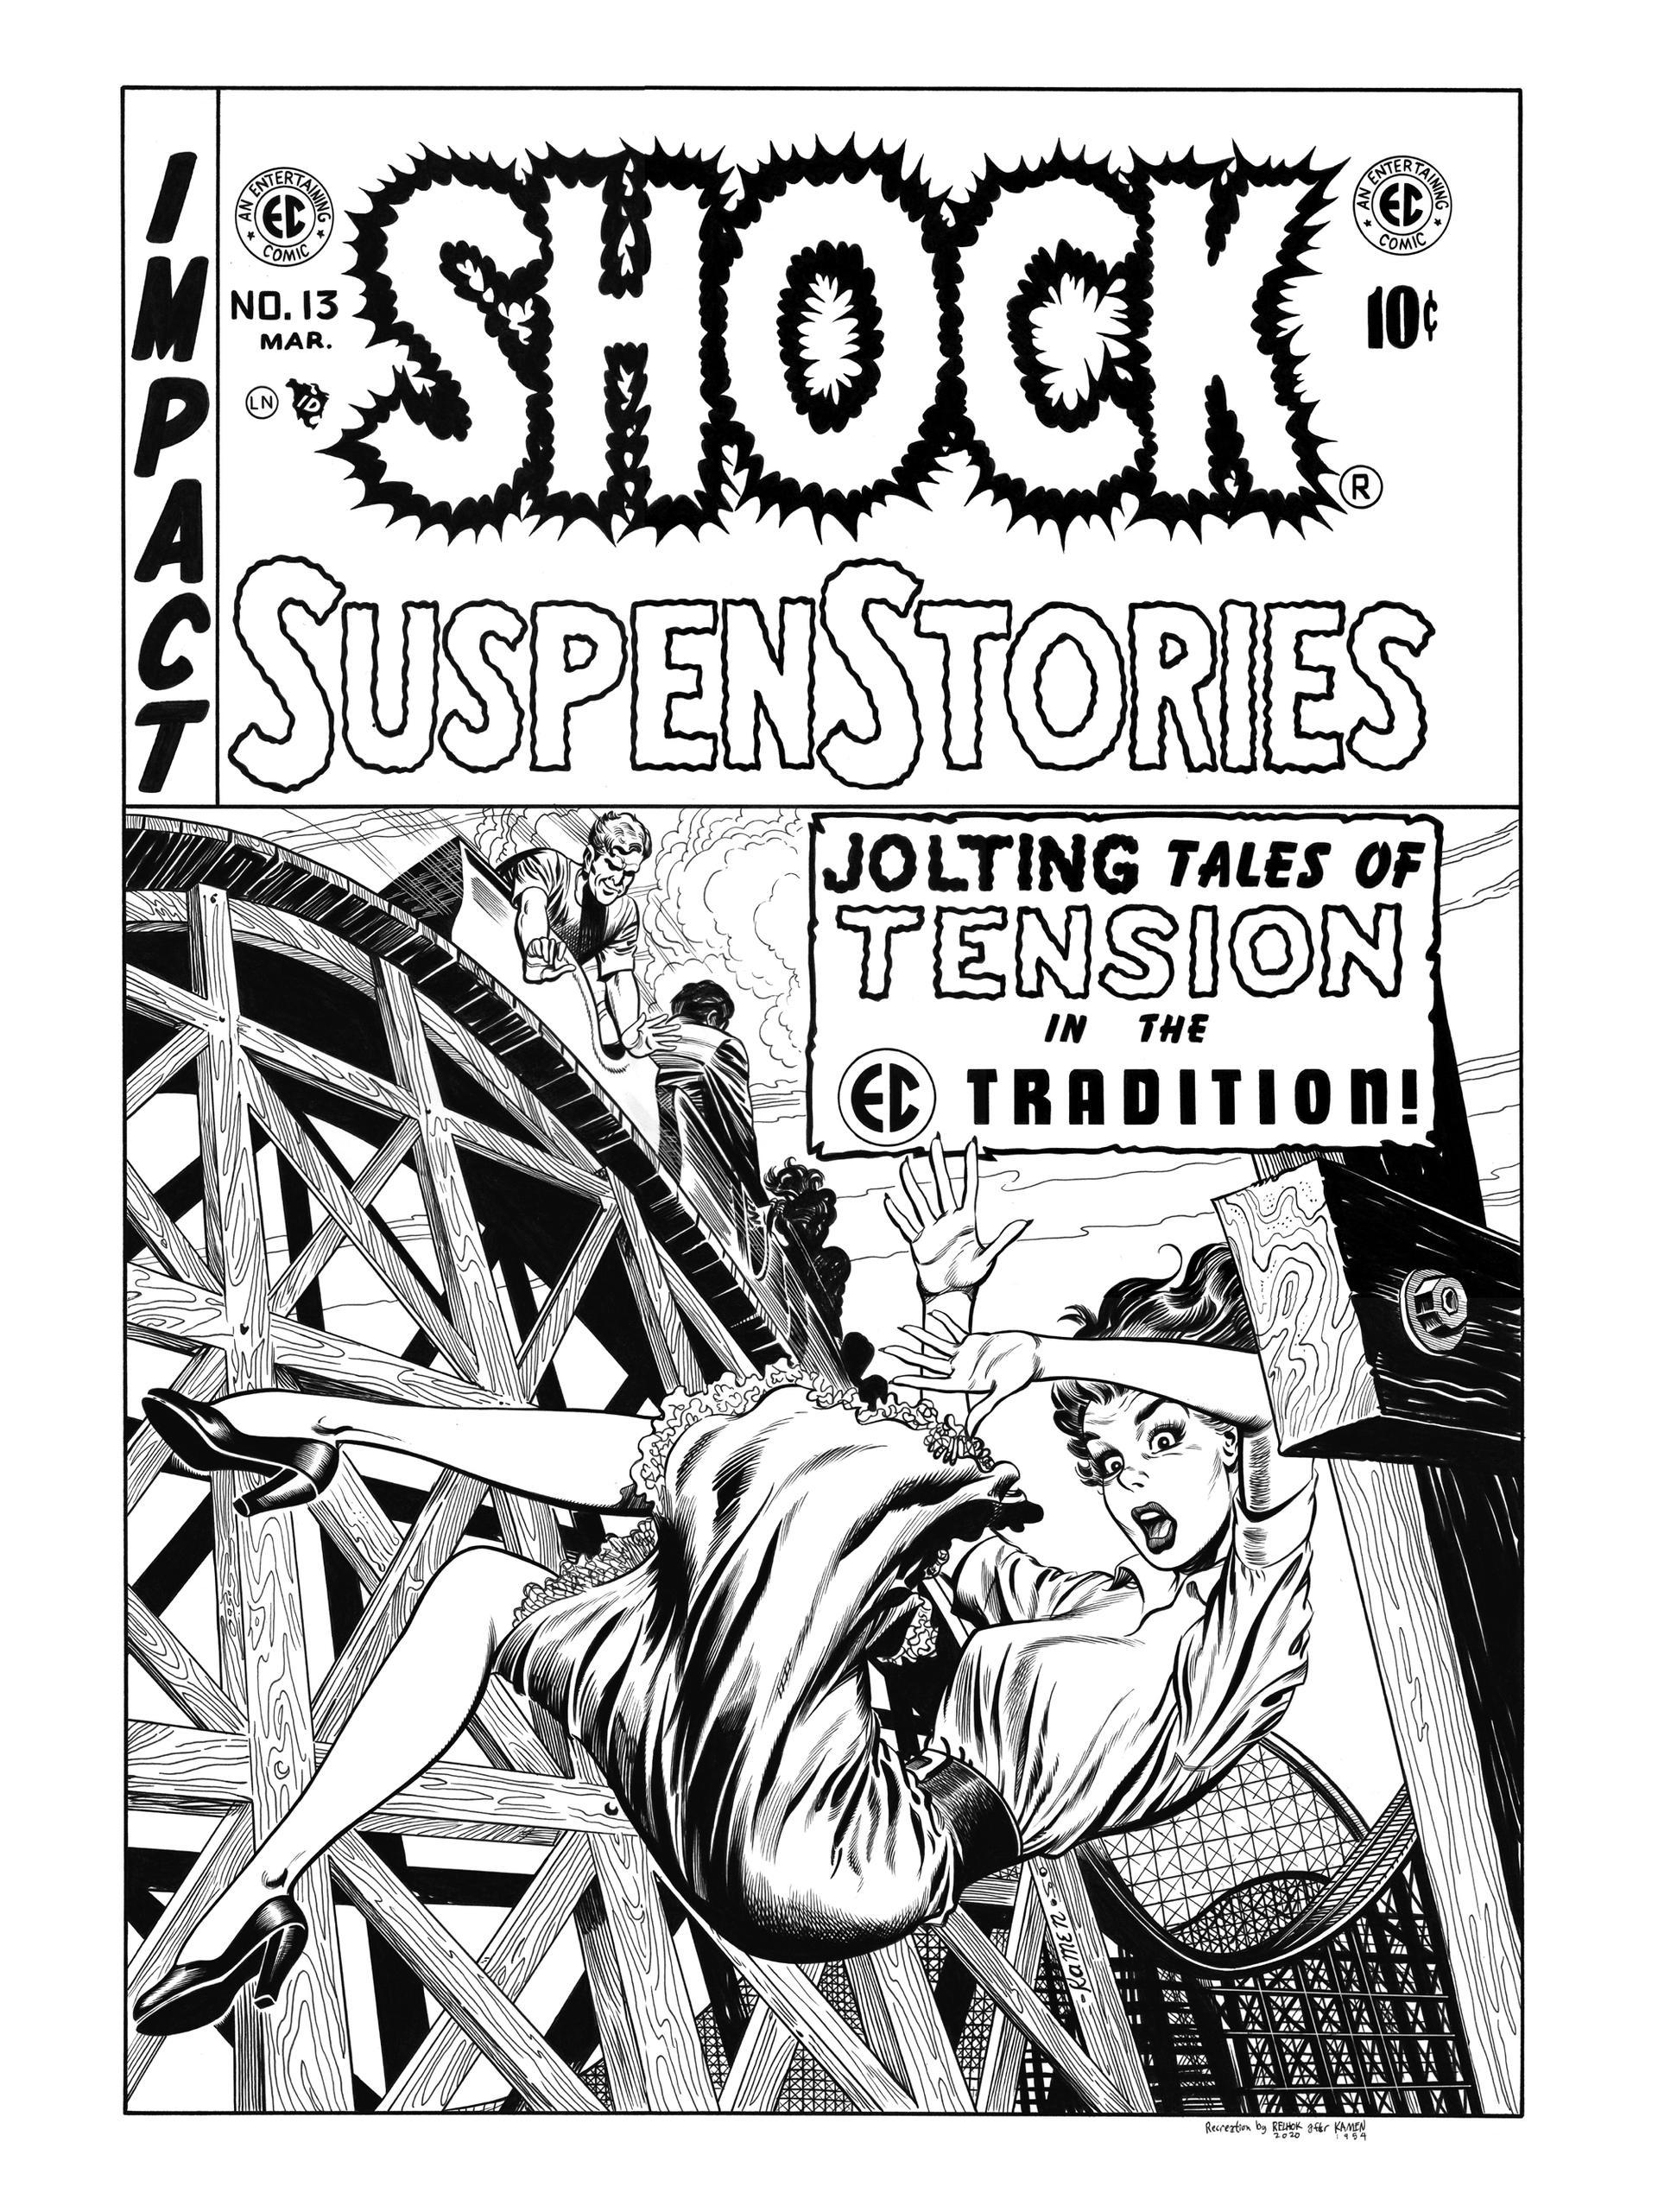 Shock SuspenStories #13 Cover Recreation